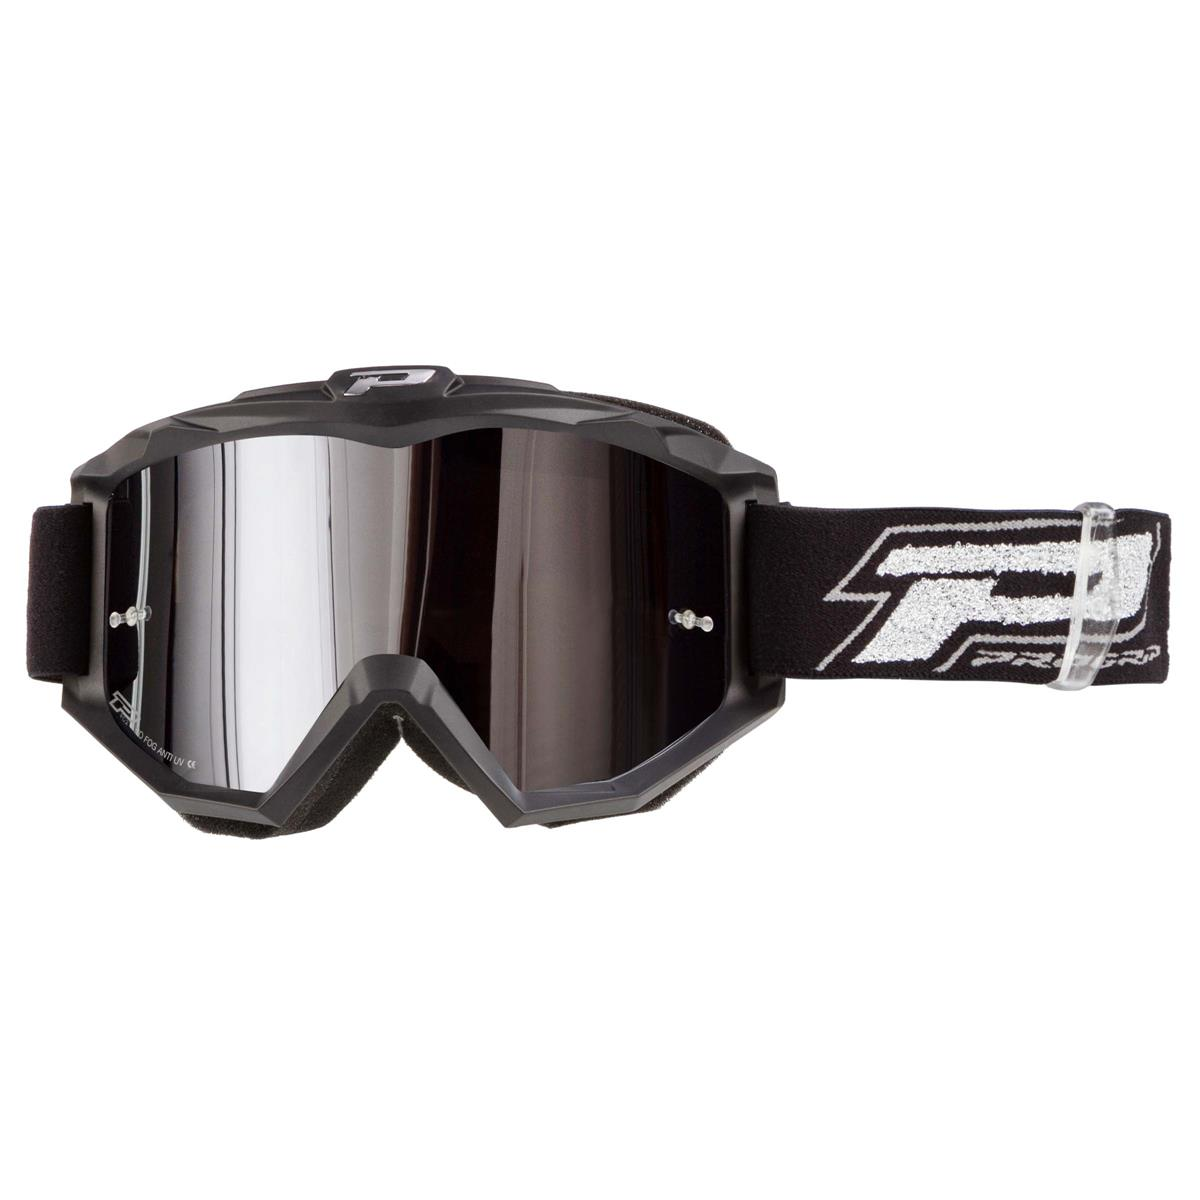 ProGrip Crossbrille 3204 FL Shiny Silber Mirrored